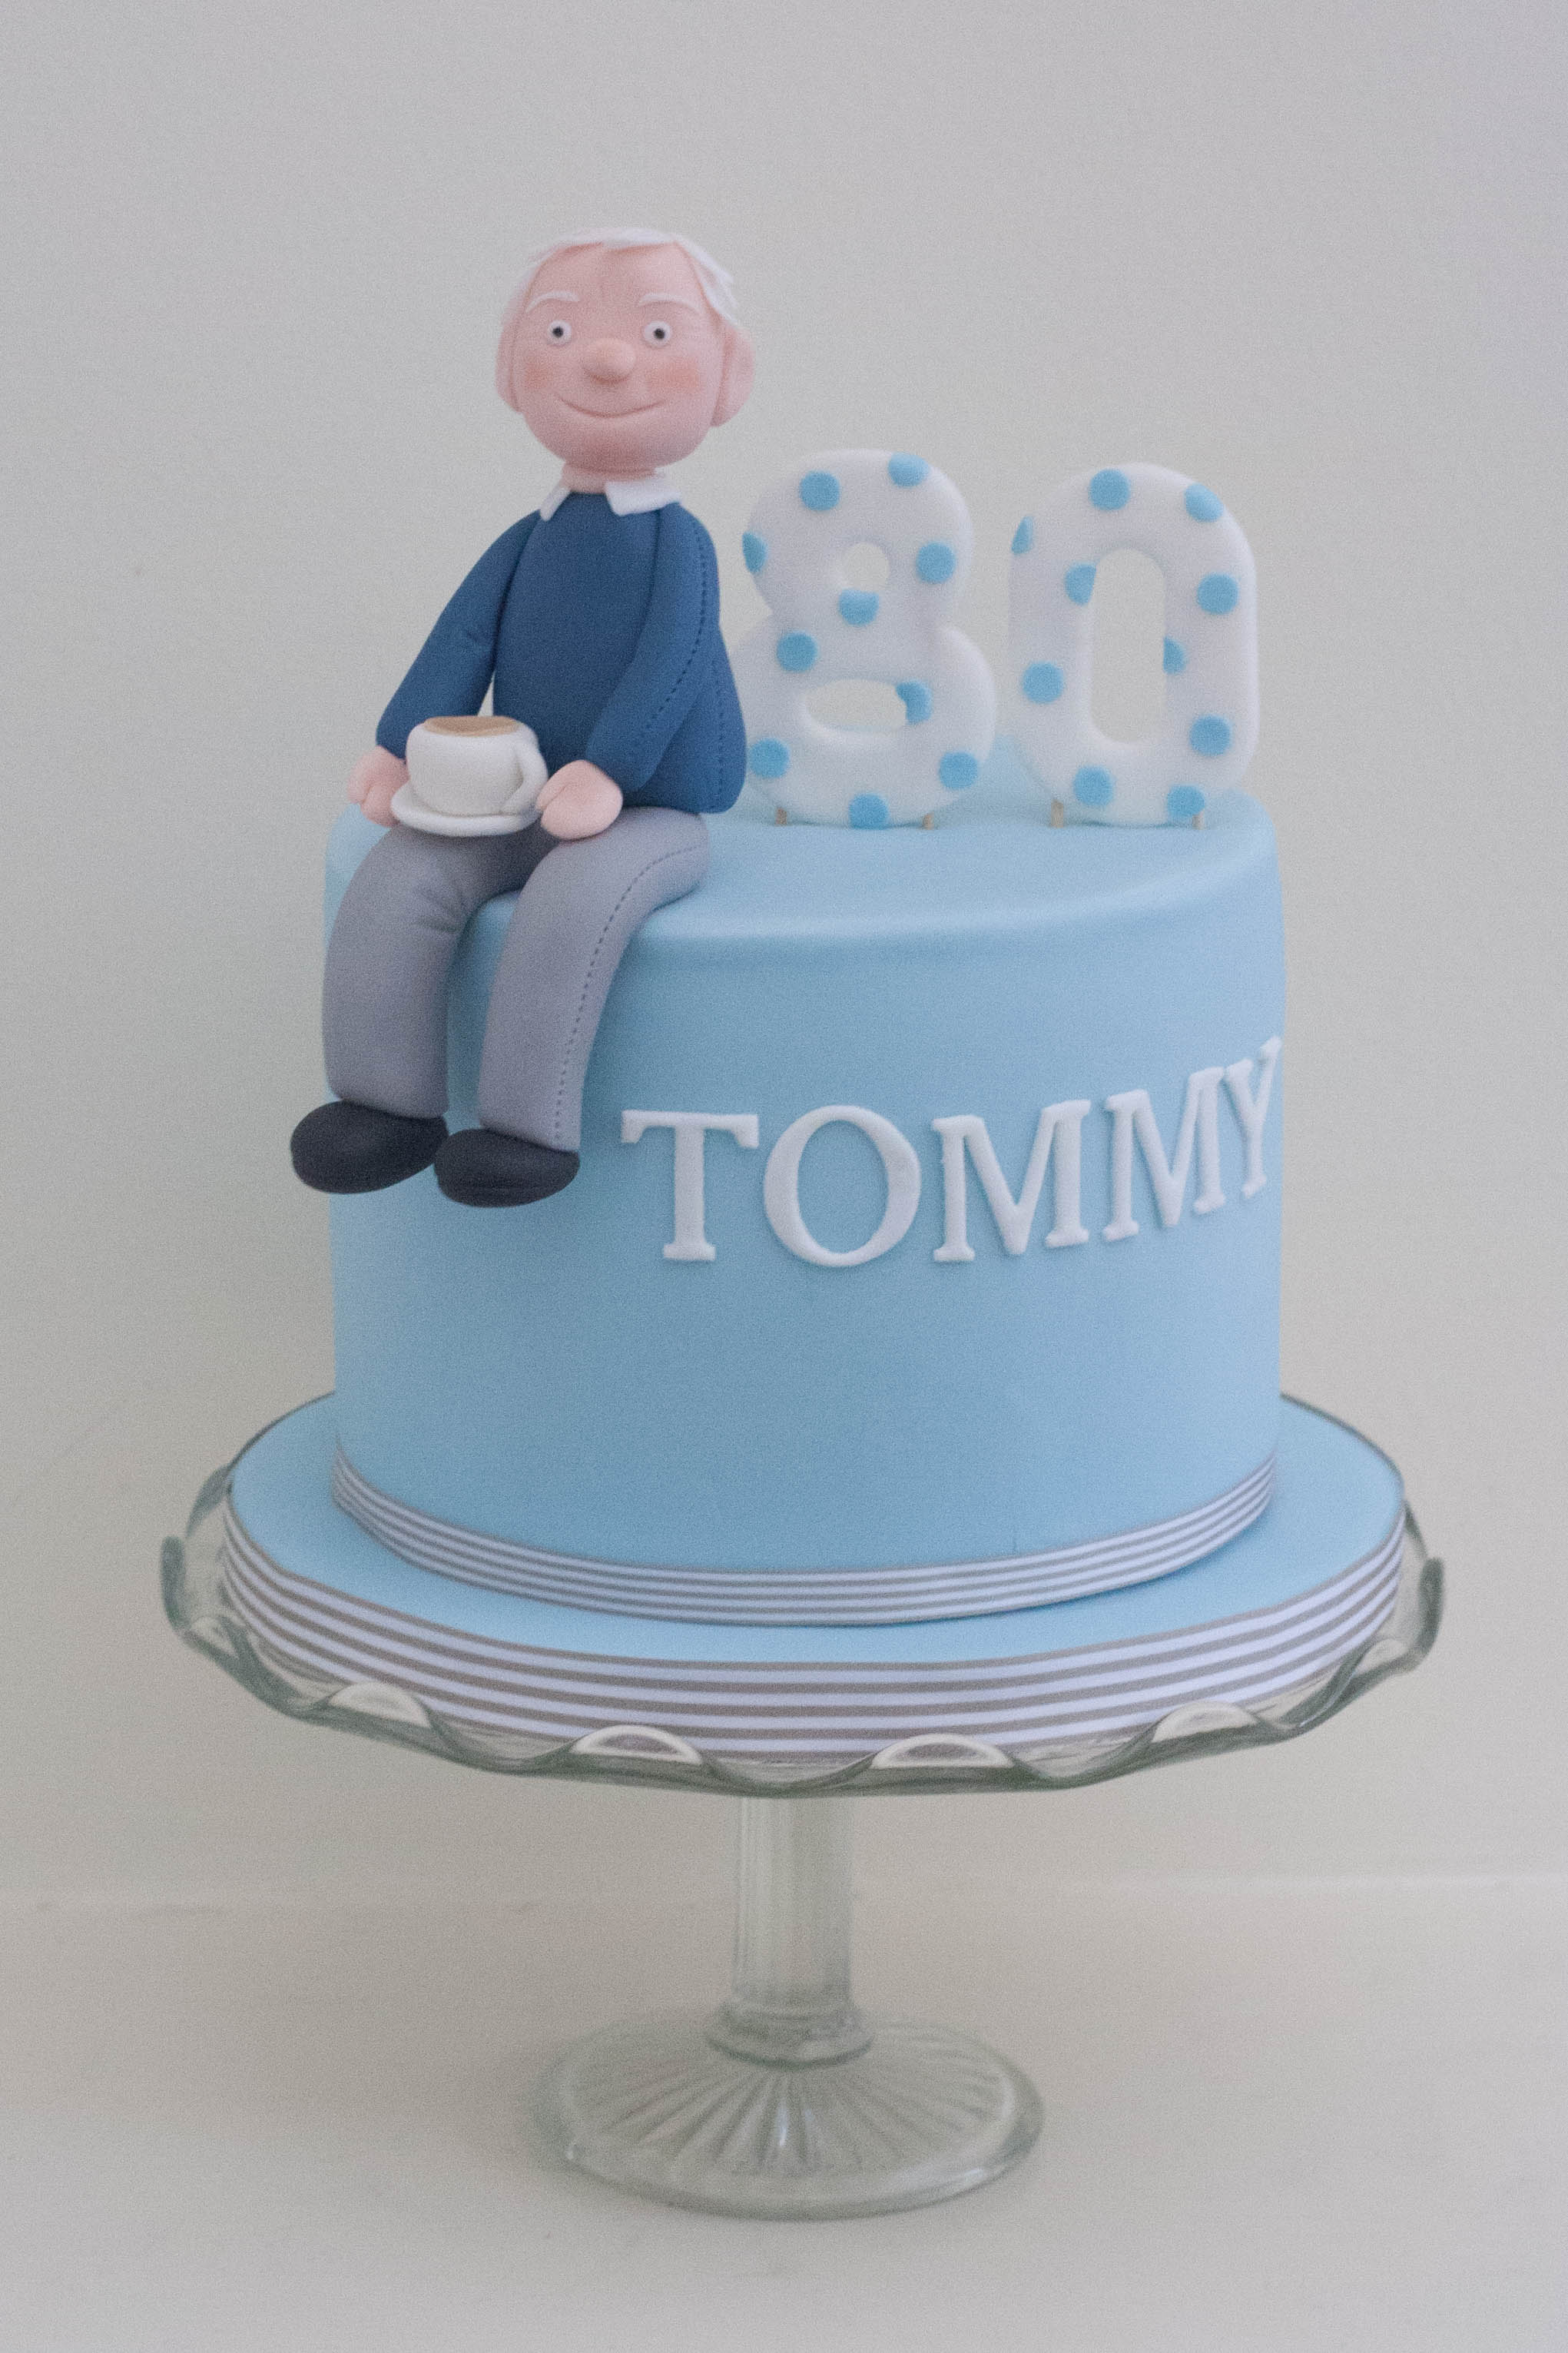 vegan 80th birthday cake with figure